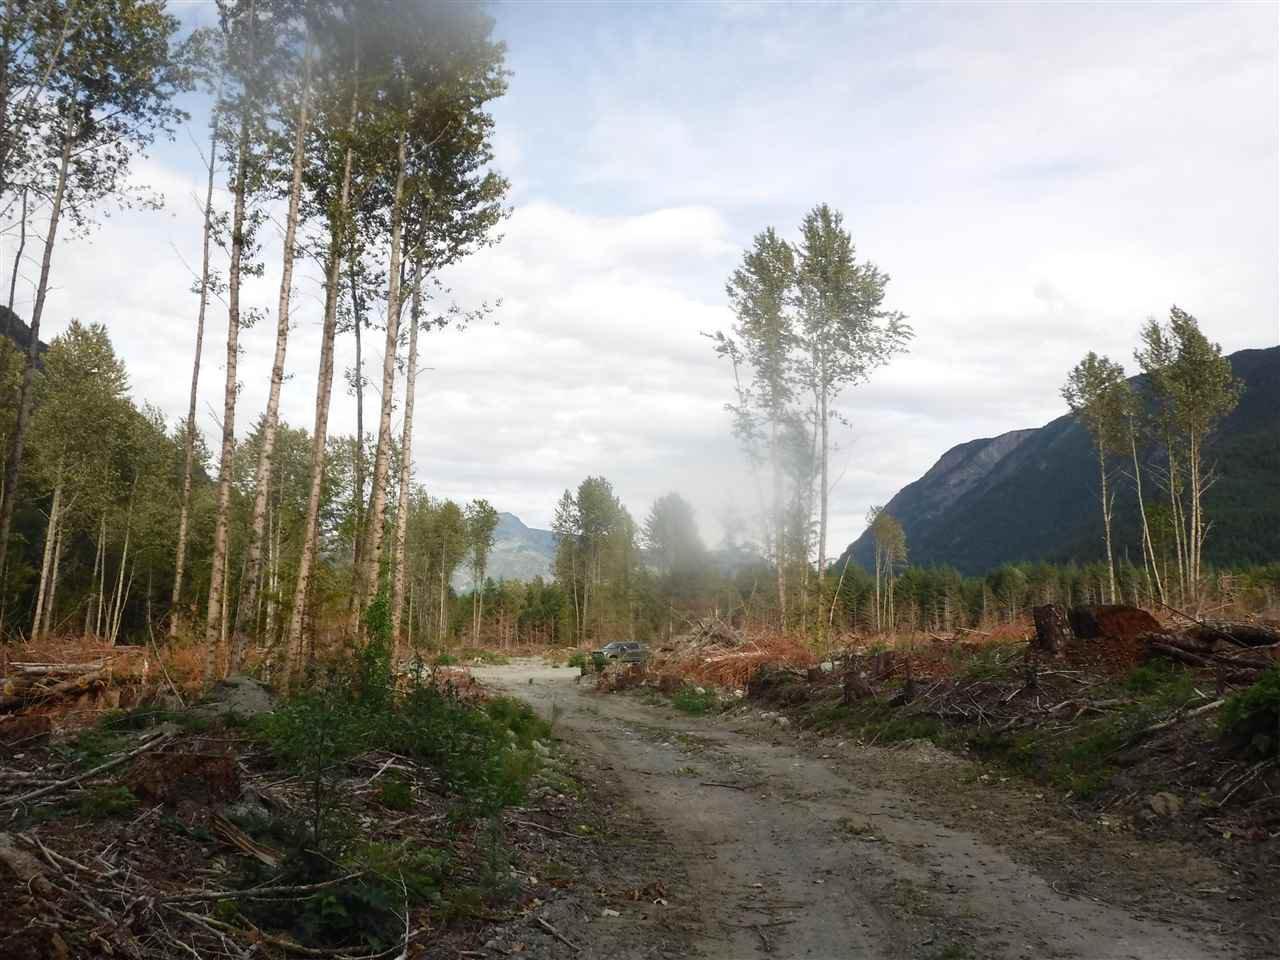 Photo 5: Photos: 3975 EAST HAMMER Road in Bella Coola: Bella Coola/Hagensborg Land for sale (Williams Lake (Zone 27))  : MLS®# R2483527